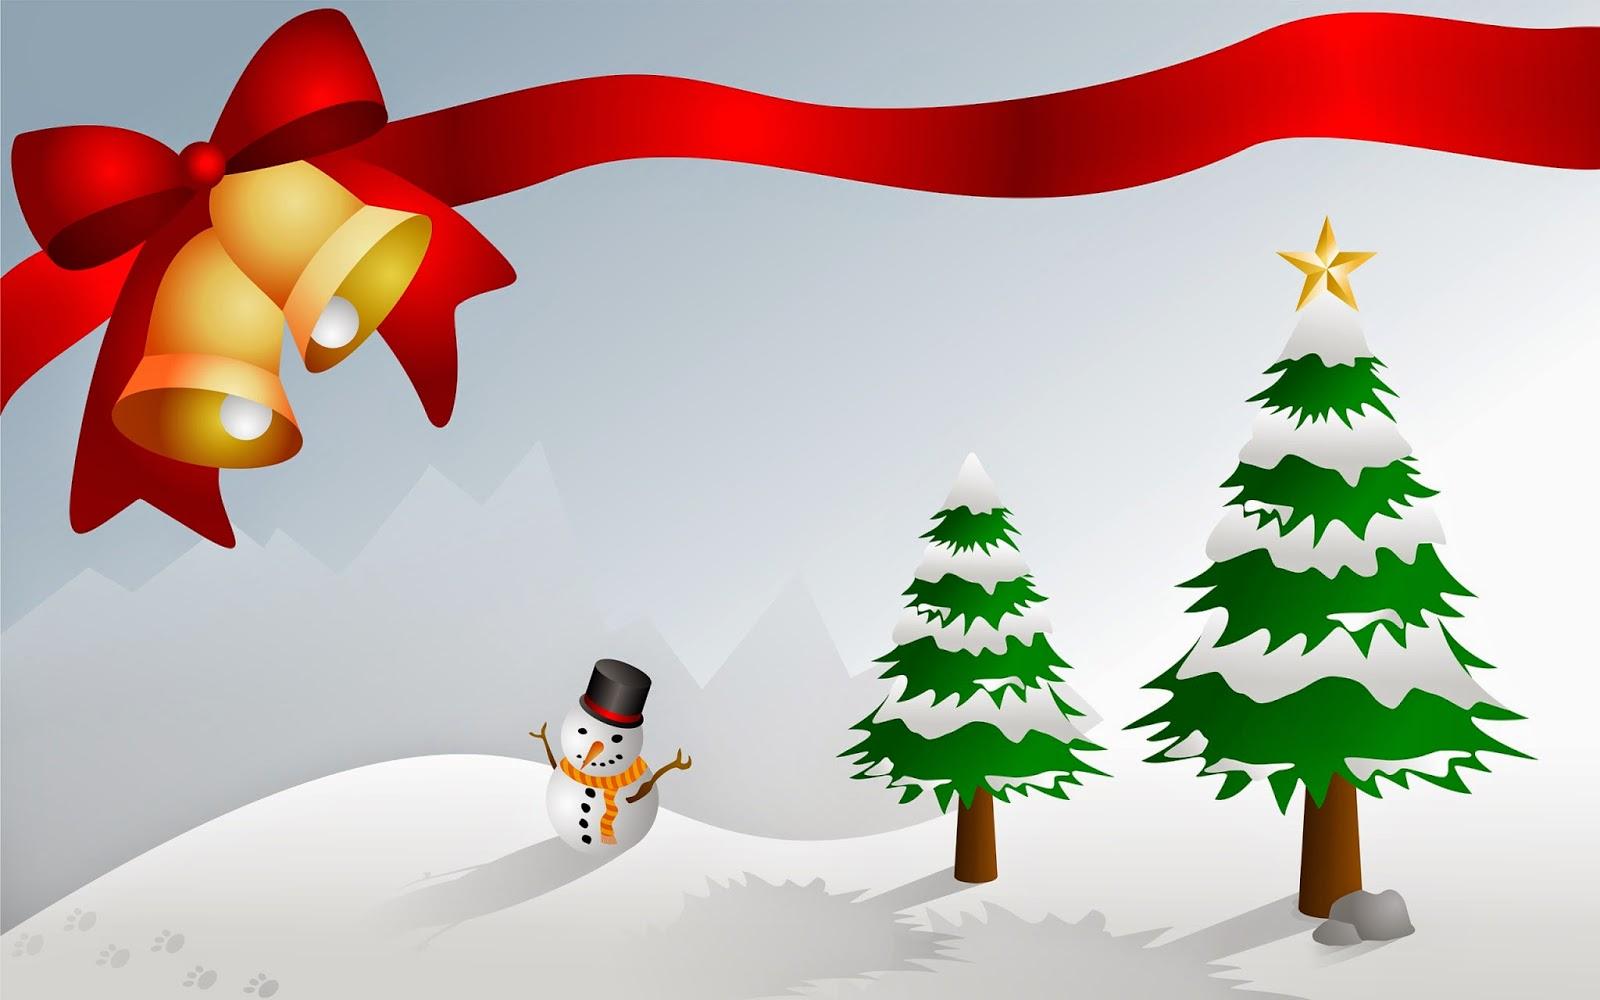 Christmas-animation-cartoon-image-with-snowman-jingle-bell-xmas-tree-2560x1600.jpg